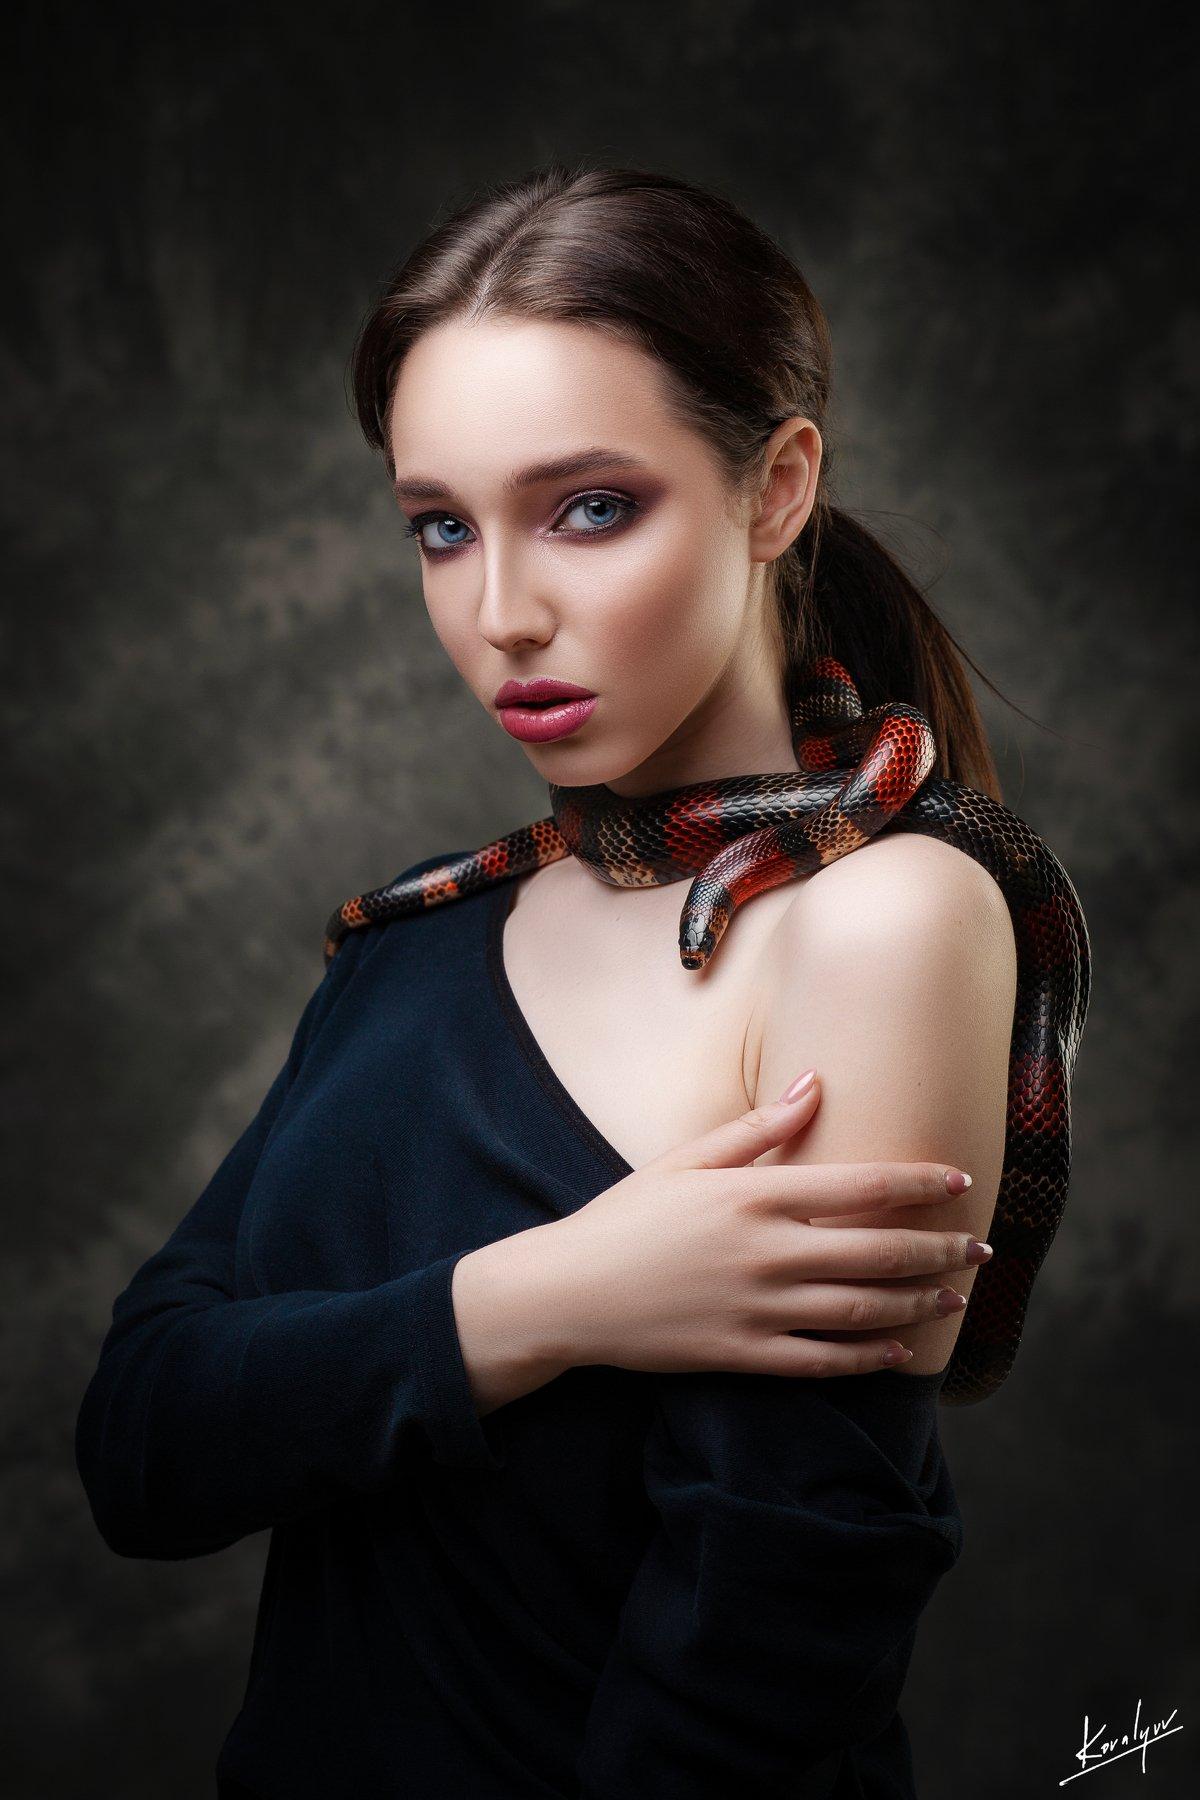 портрет, девушка, бьюти, ретушь, Ковалёв Иван